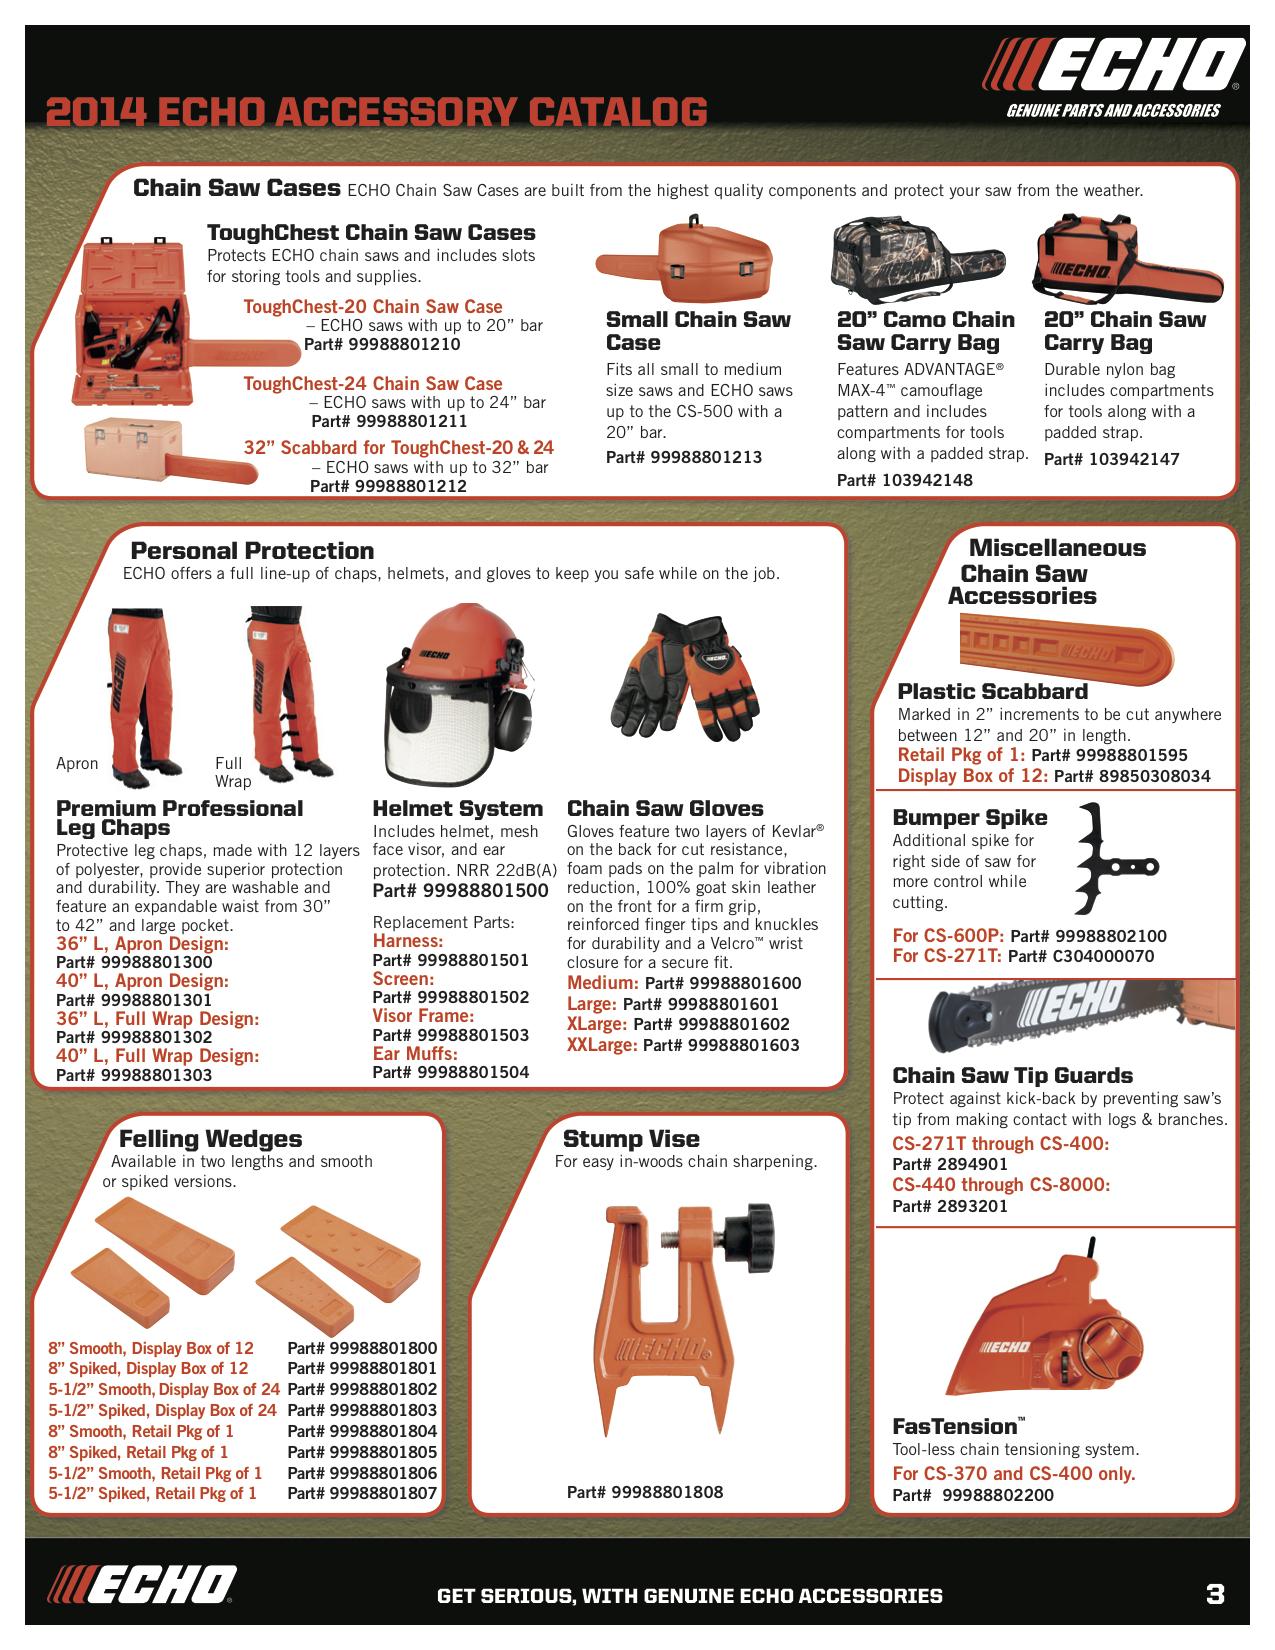 Chainsaw Accessories 2014.jpg